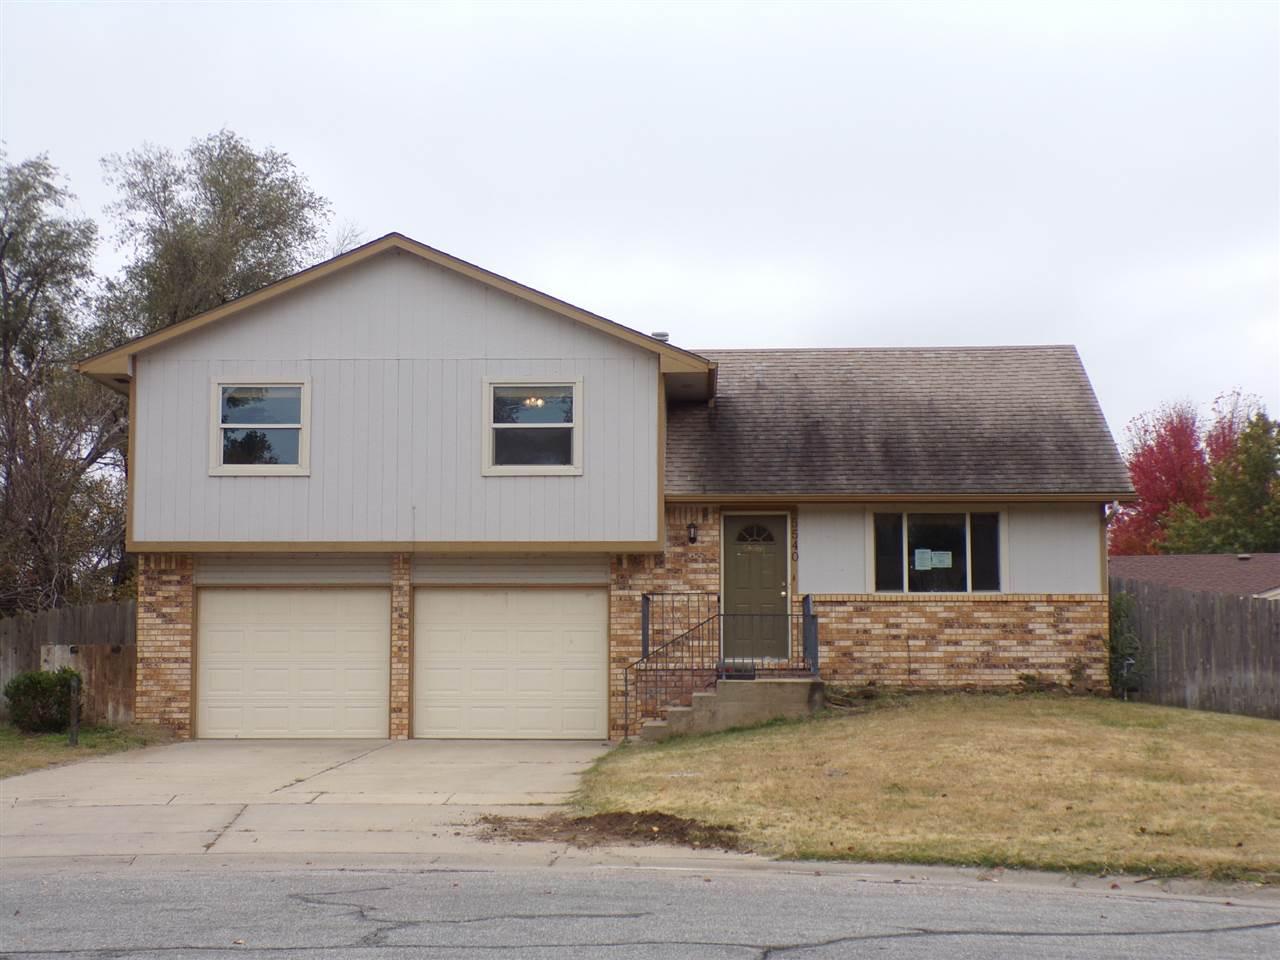 5540 S Mosley Ct, Wichita, KS, 67216